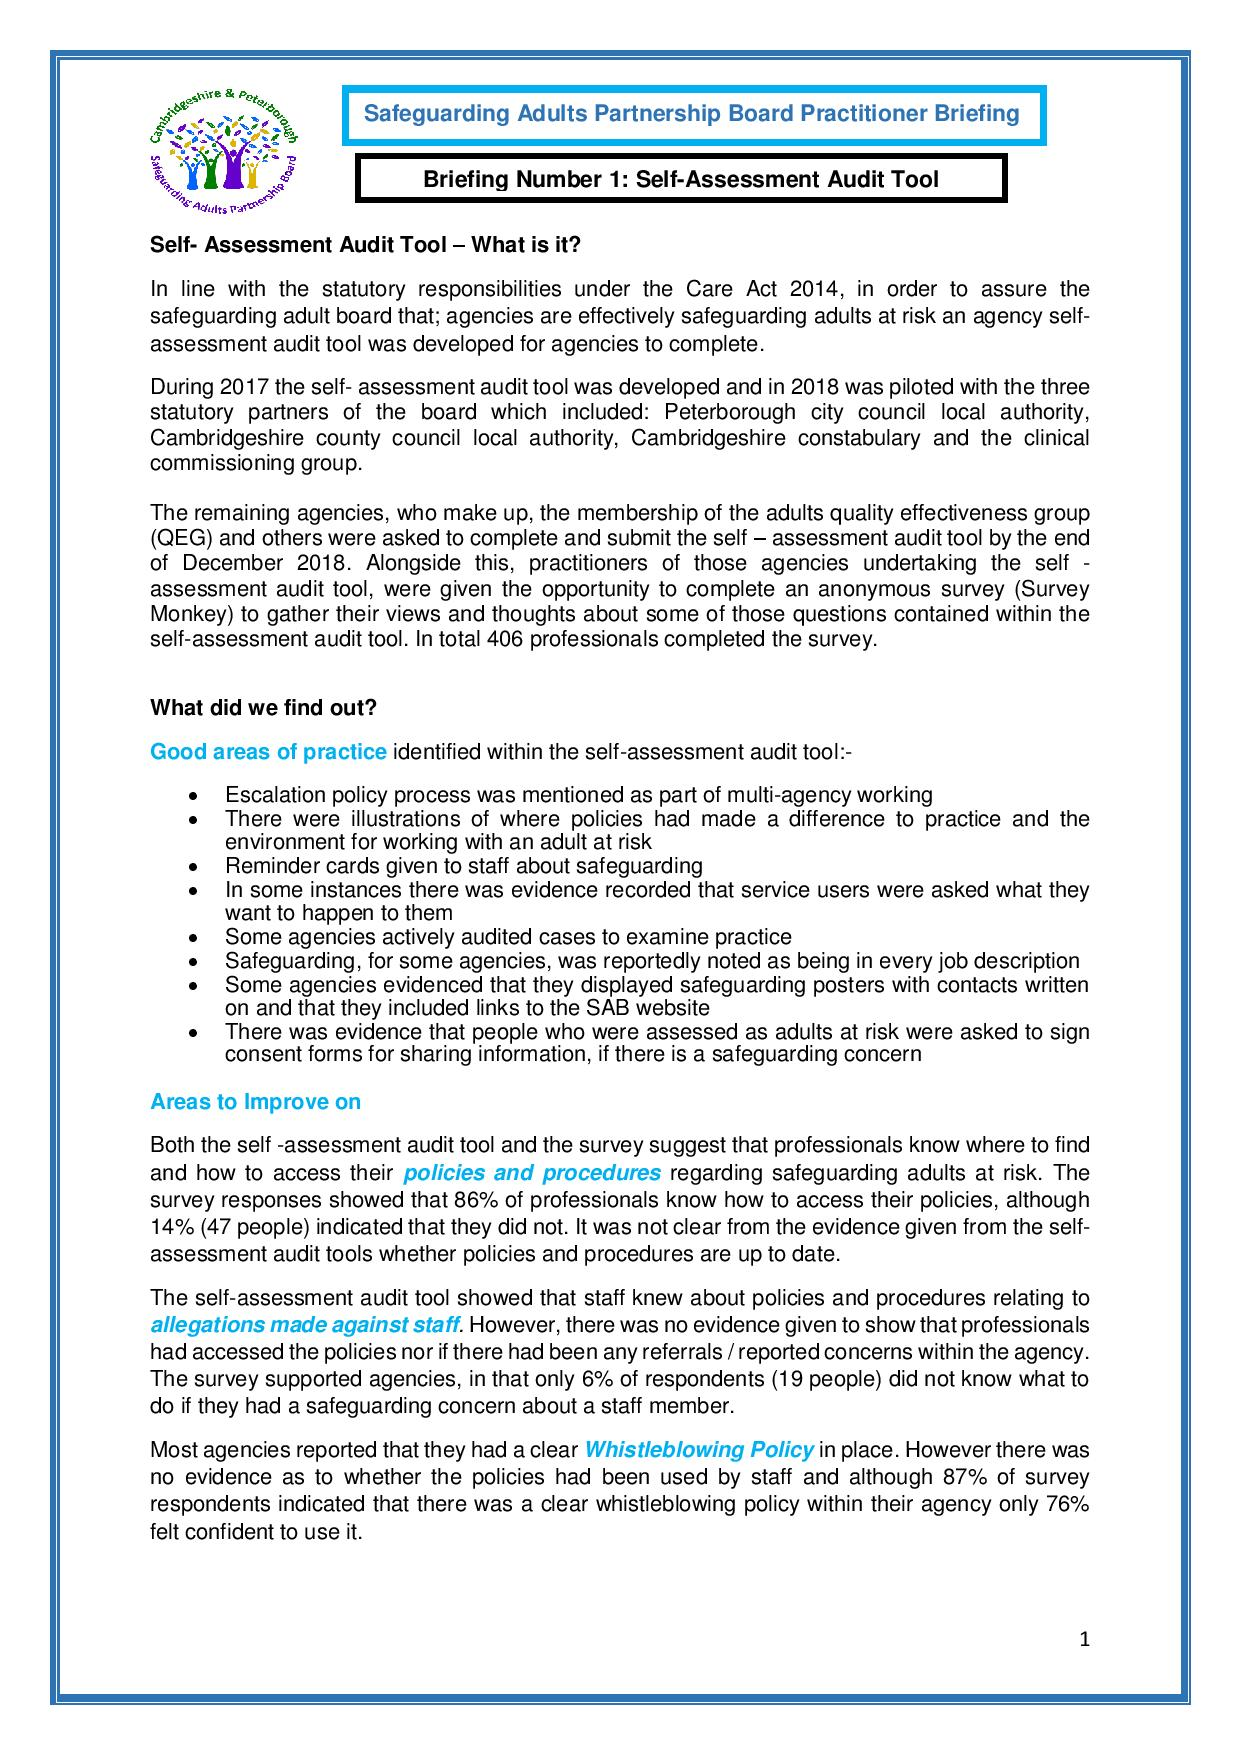 Self-Assessment Audit Tool Briefing